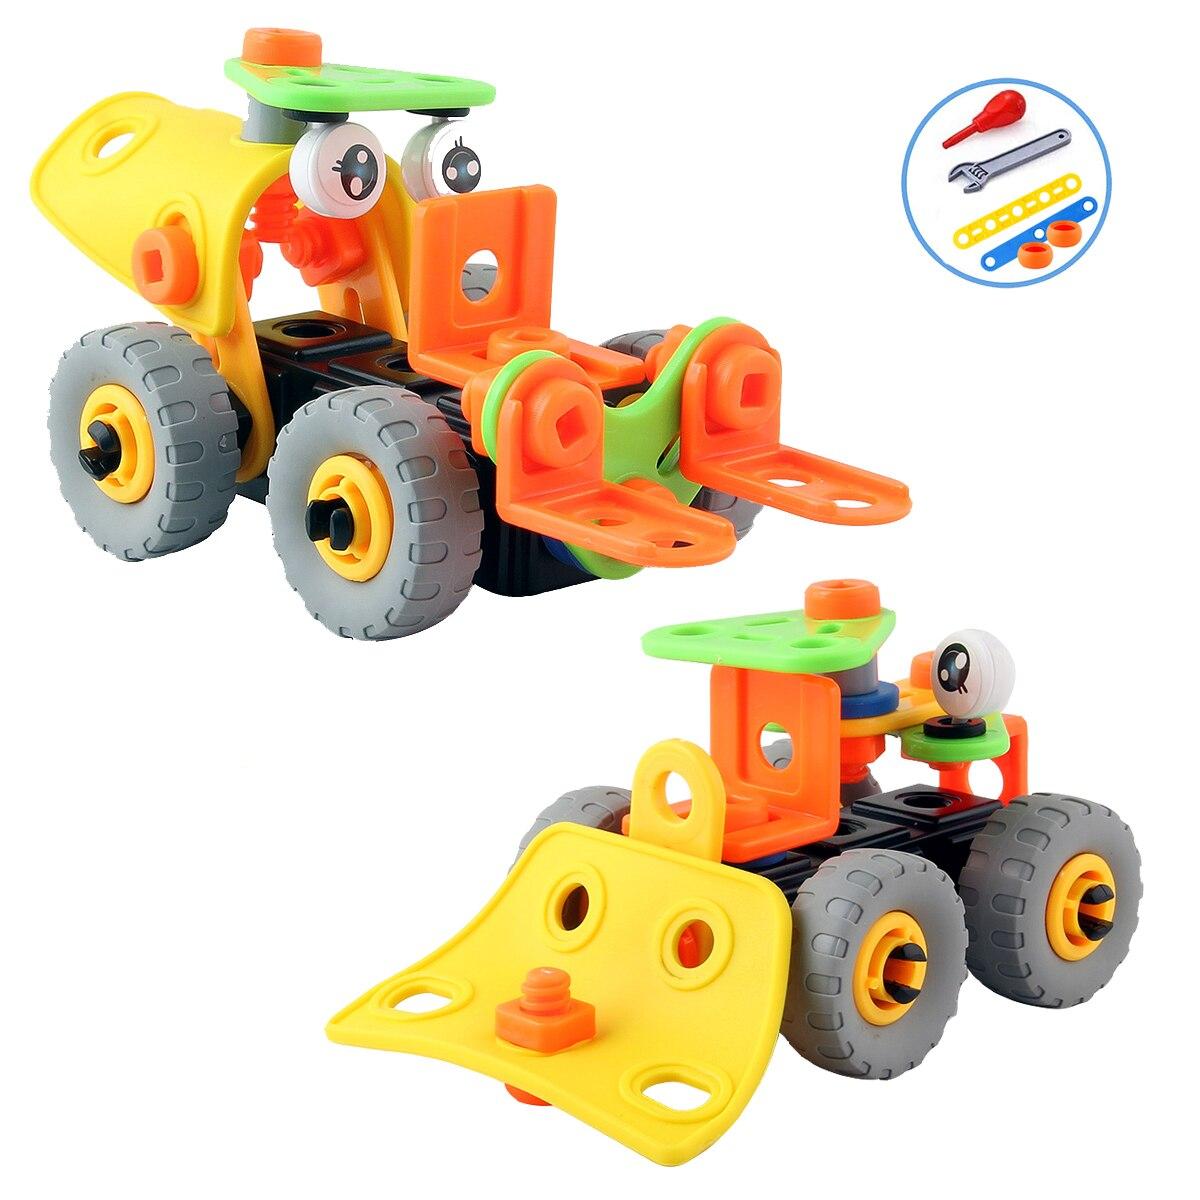 STEM Building Nut Disassembly Engineering Truck Crane Forklift Glider Kids Screw Boys Creative Tool Education Toys DIY Car Model